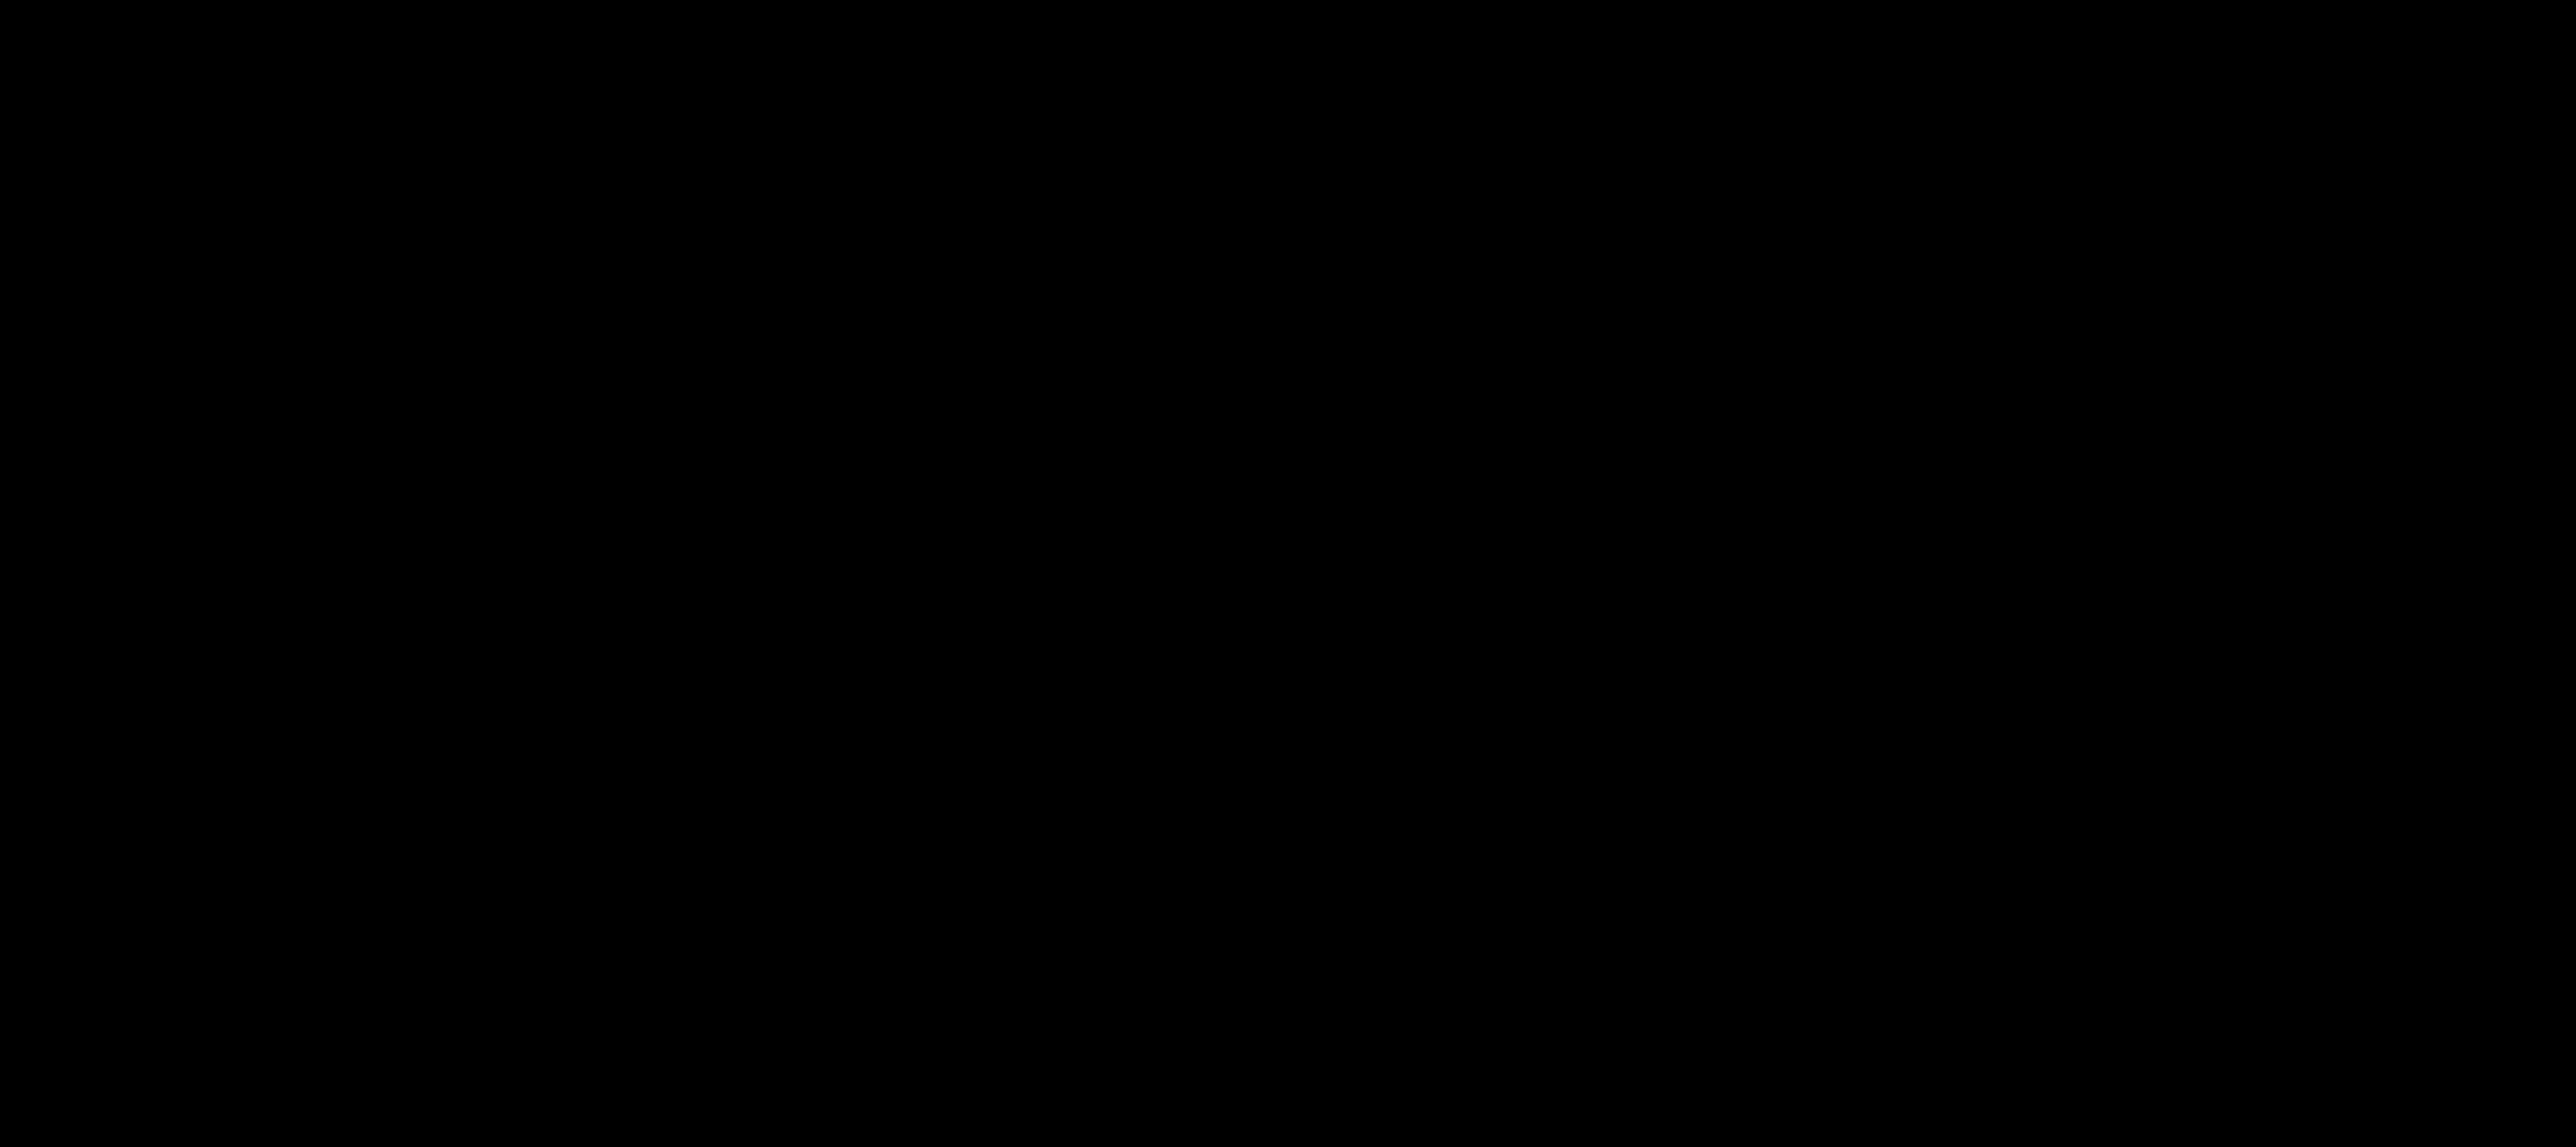 Logo Stephanie Muley black